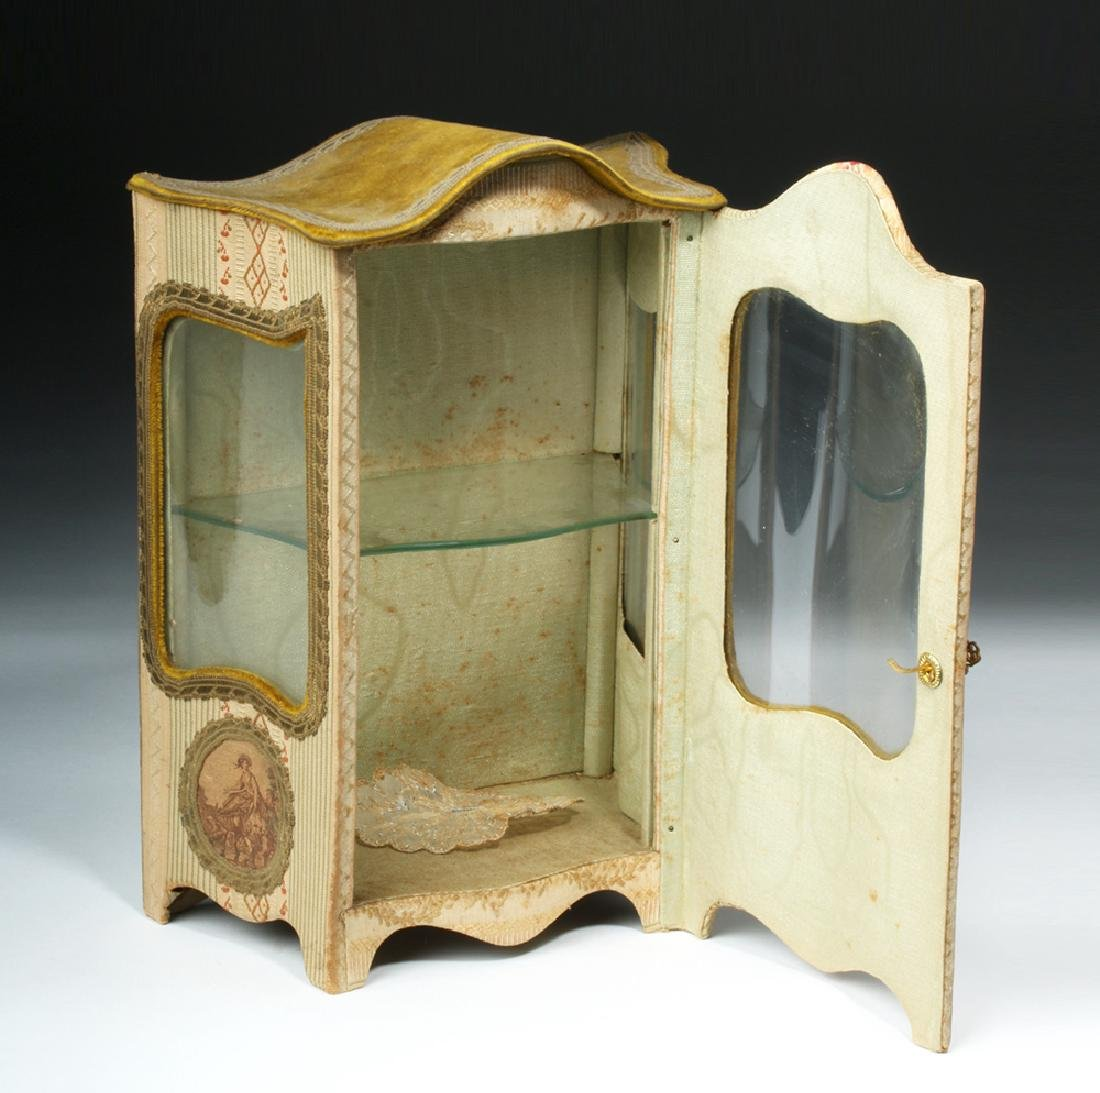 19th C. French Vernis Martin Miniature Hutch - 3